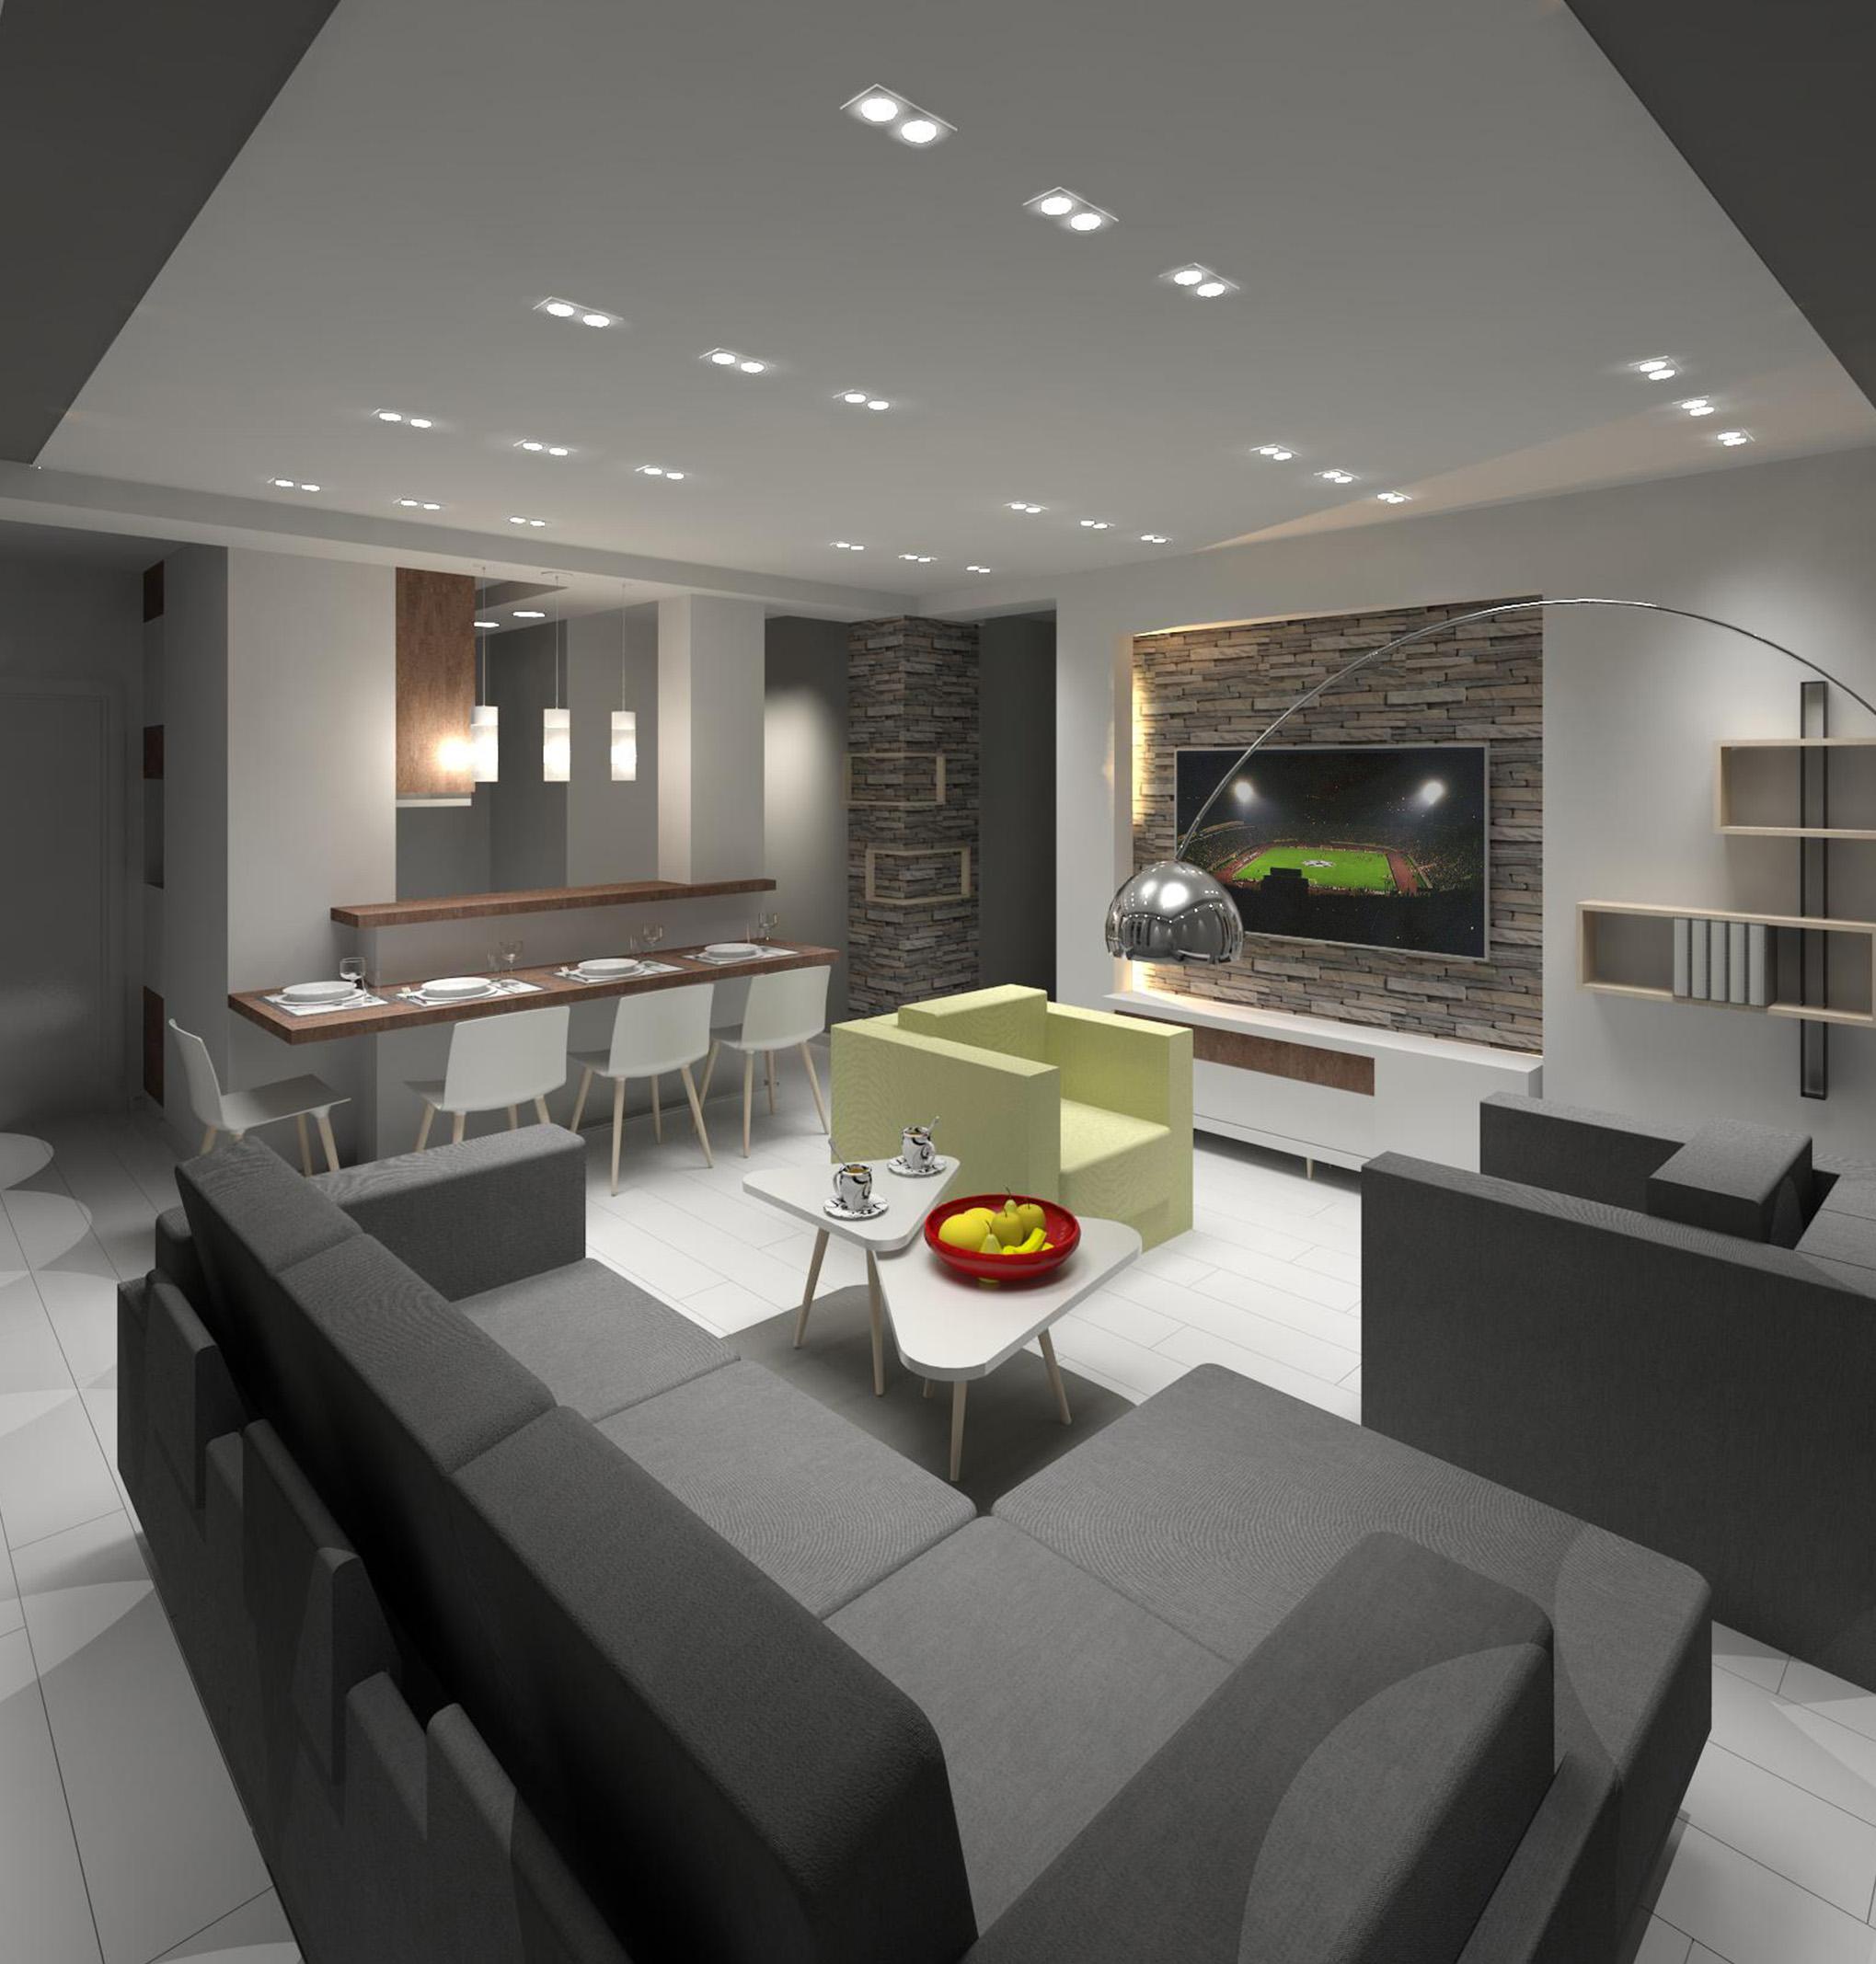 Prostran stan za celu porodicu